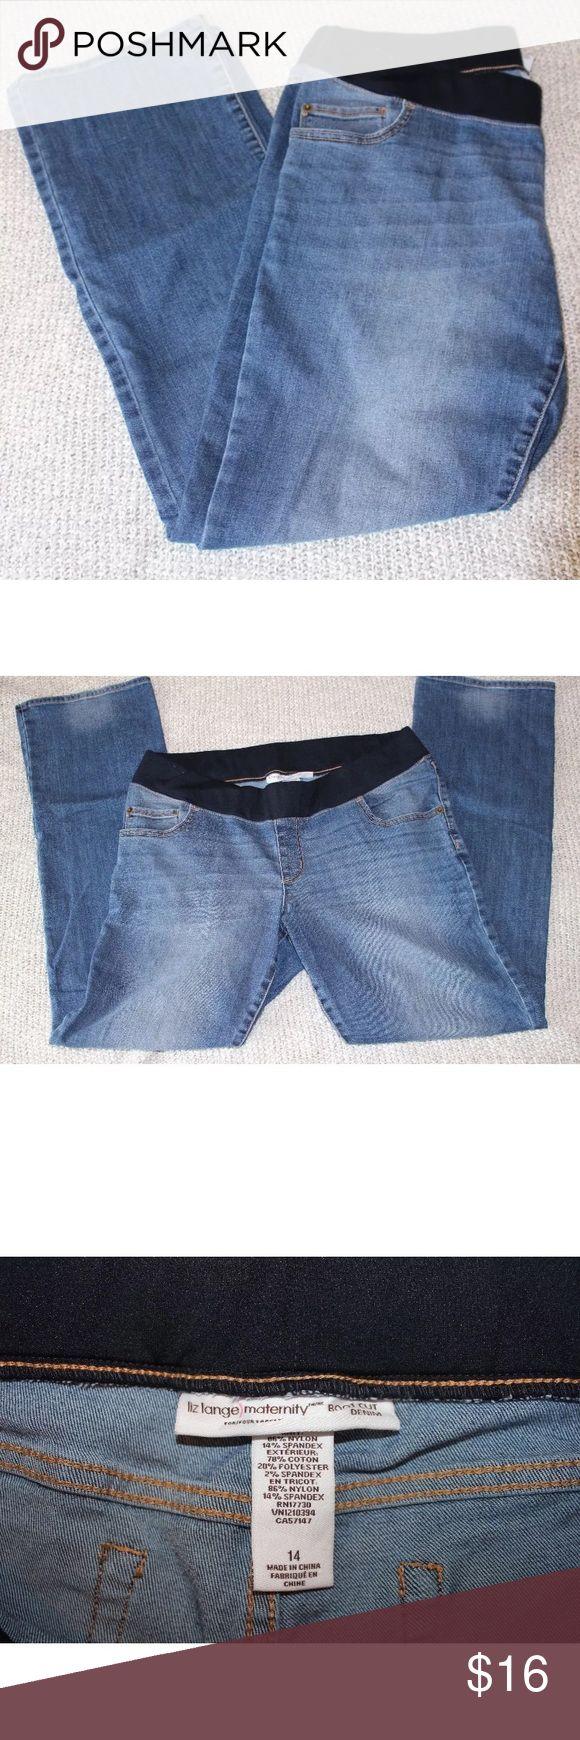 Bootcut jeans damen lange 36